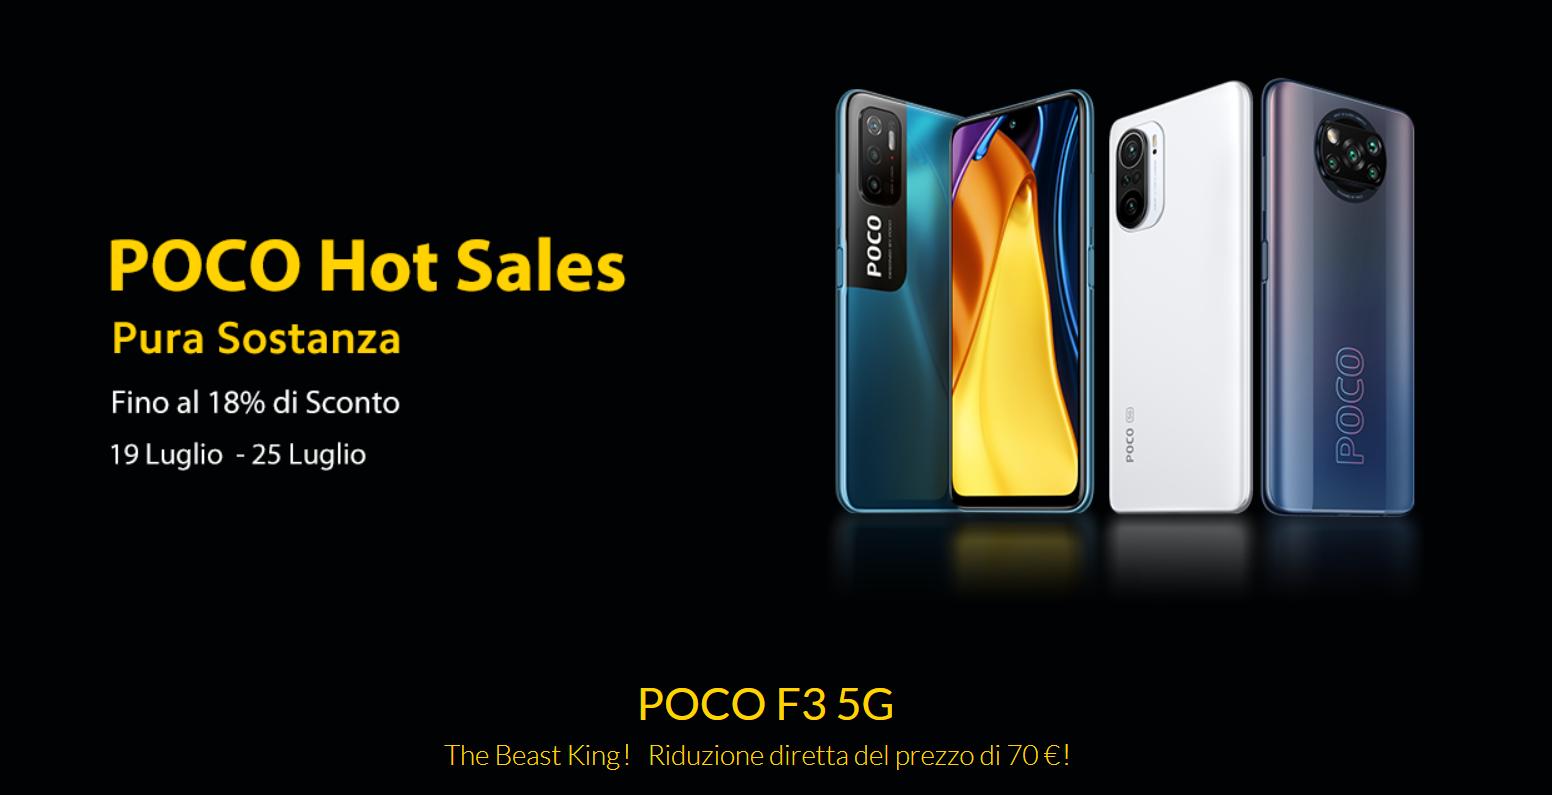 Offerte POCO Hot Sales